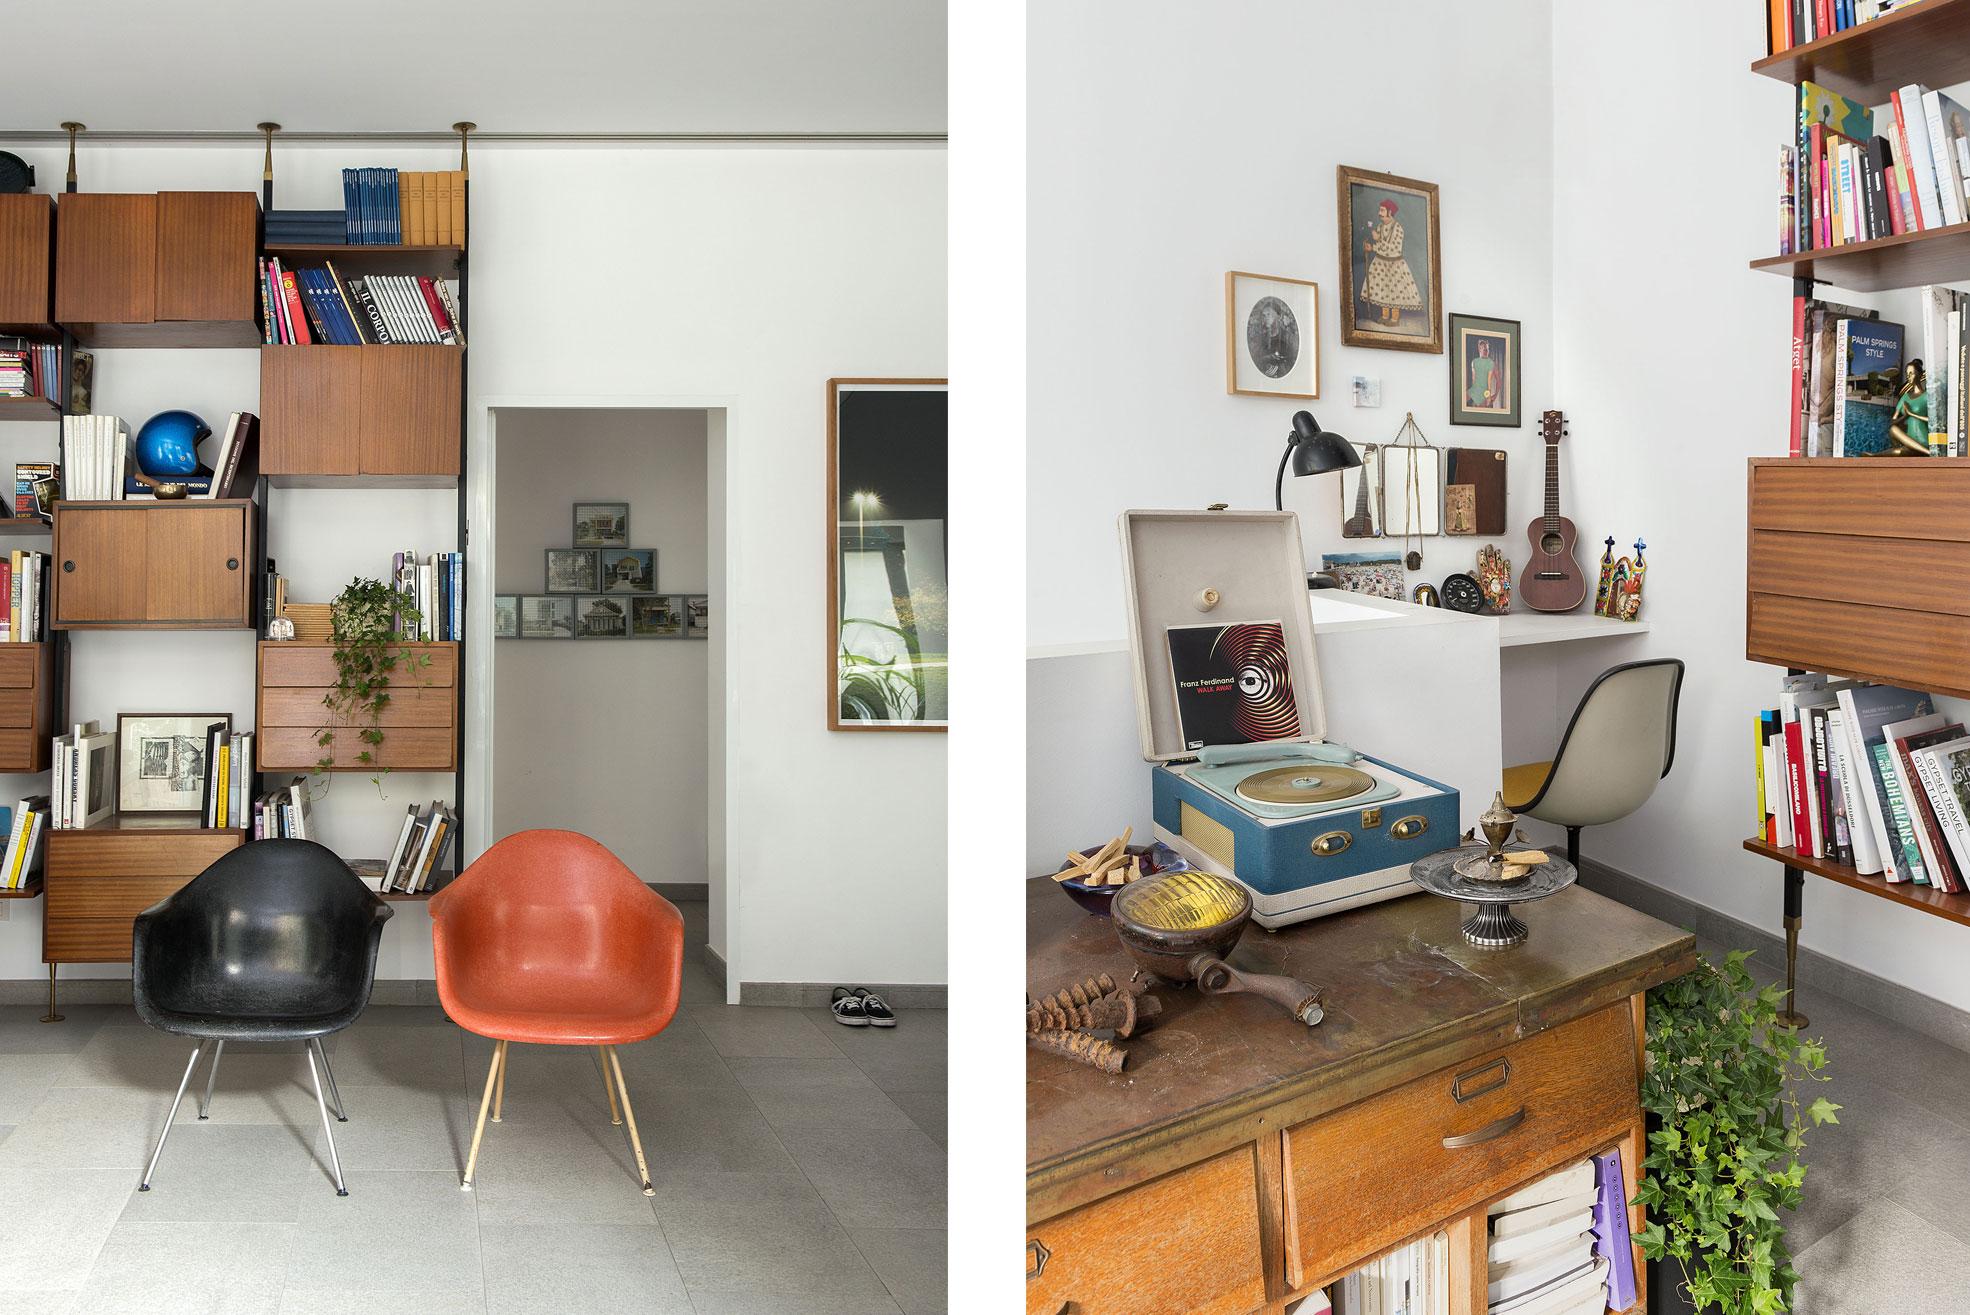 Library of the gipsy house of Giovanna Forlivesi Photographer Maria Teresa Furnari